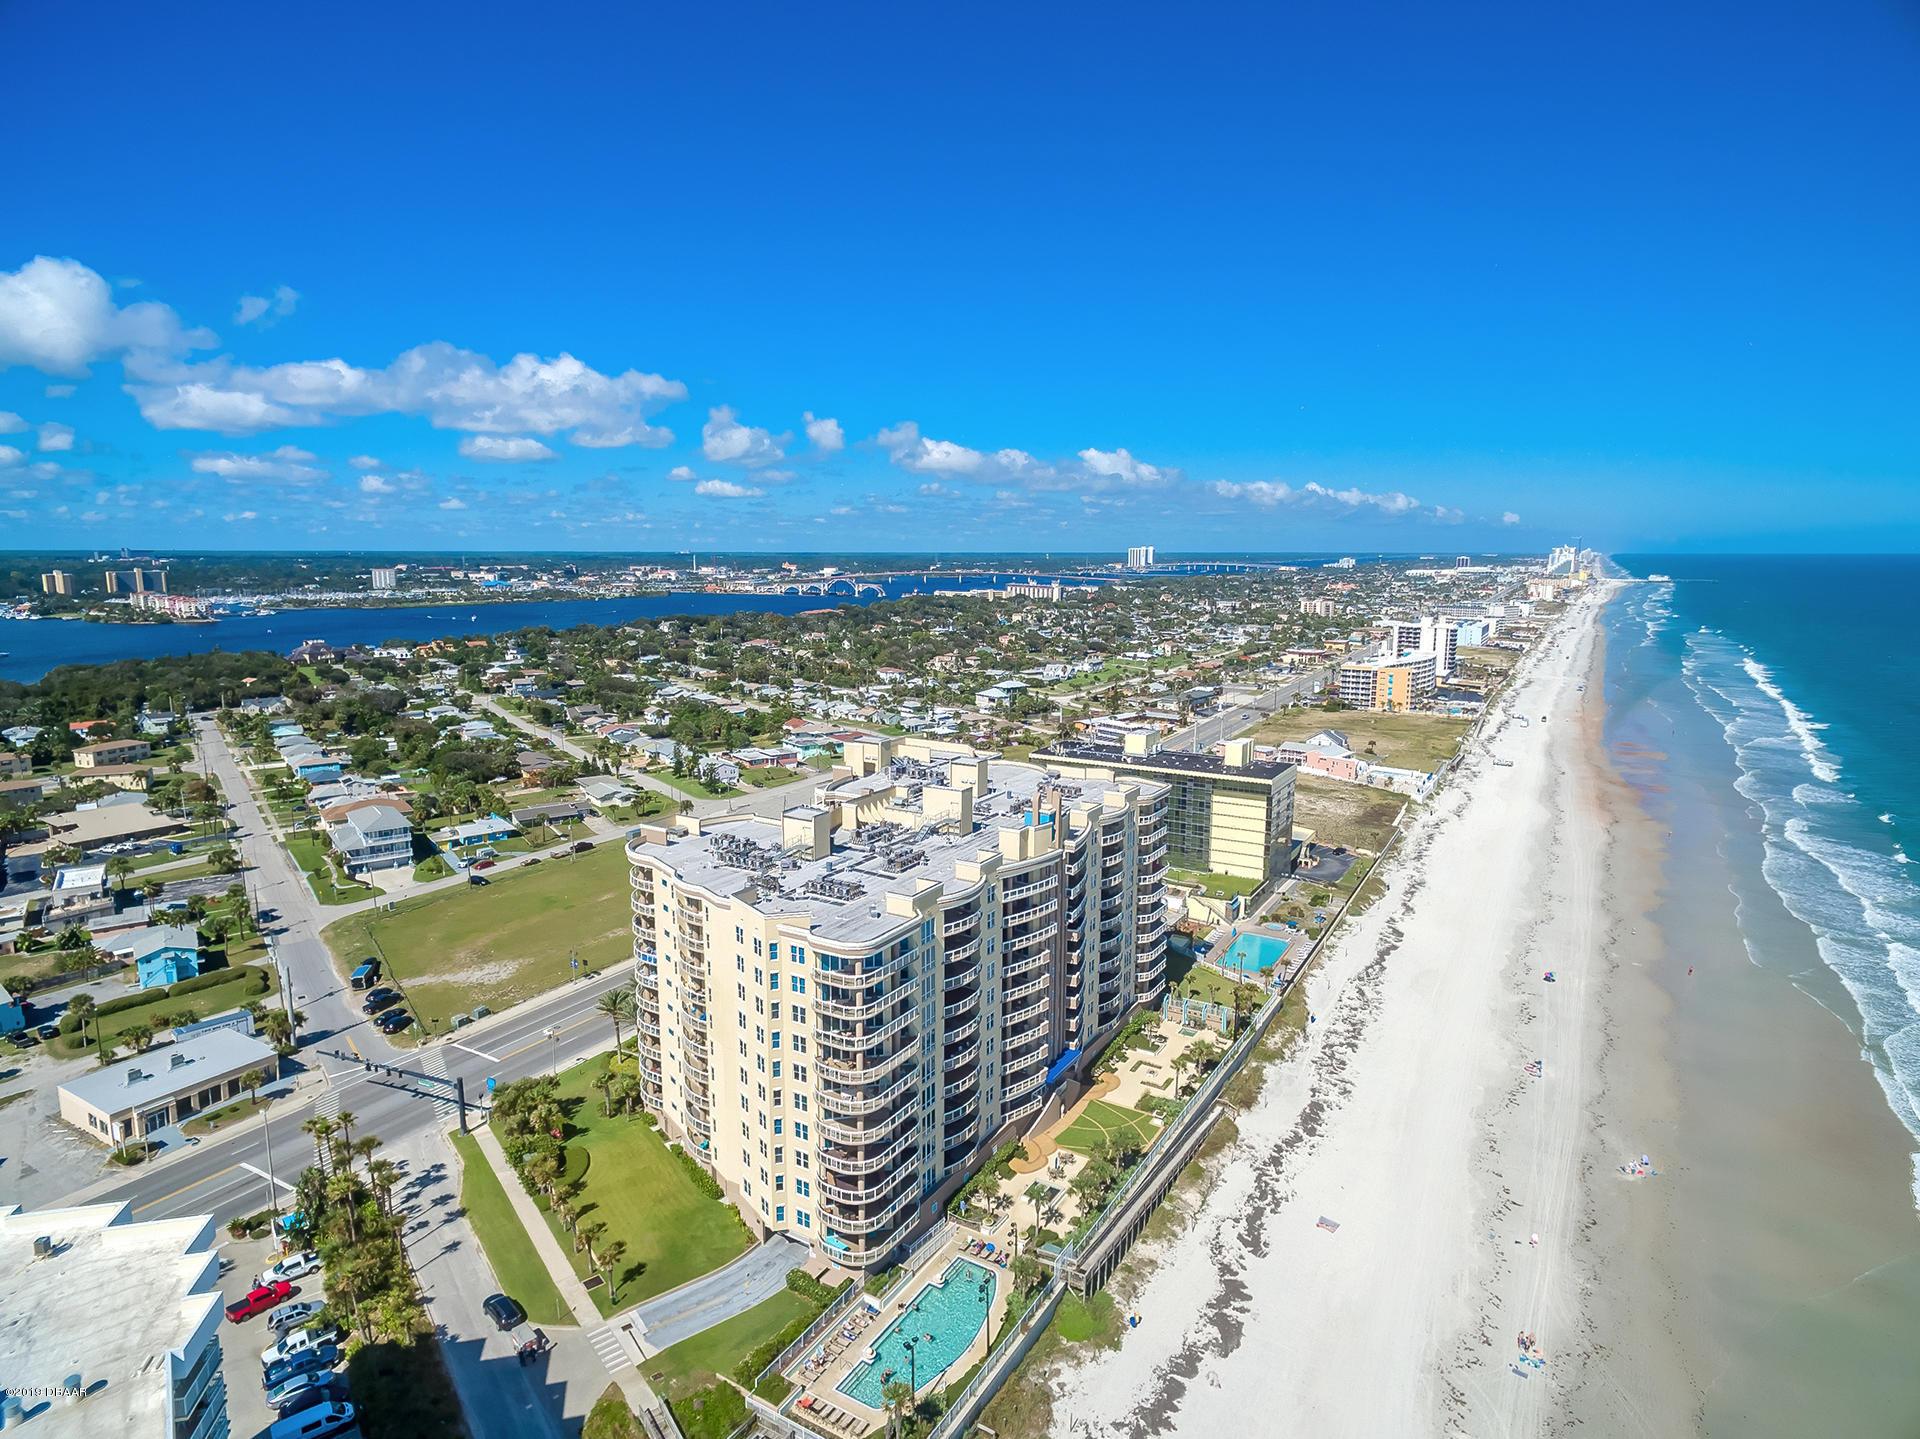 1925 S Atlantic Avenue, Daytona Beach Shores, Florida